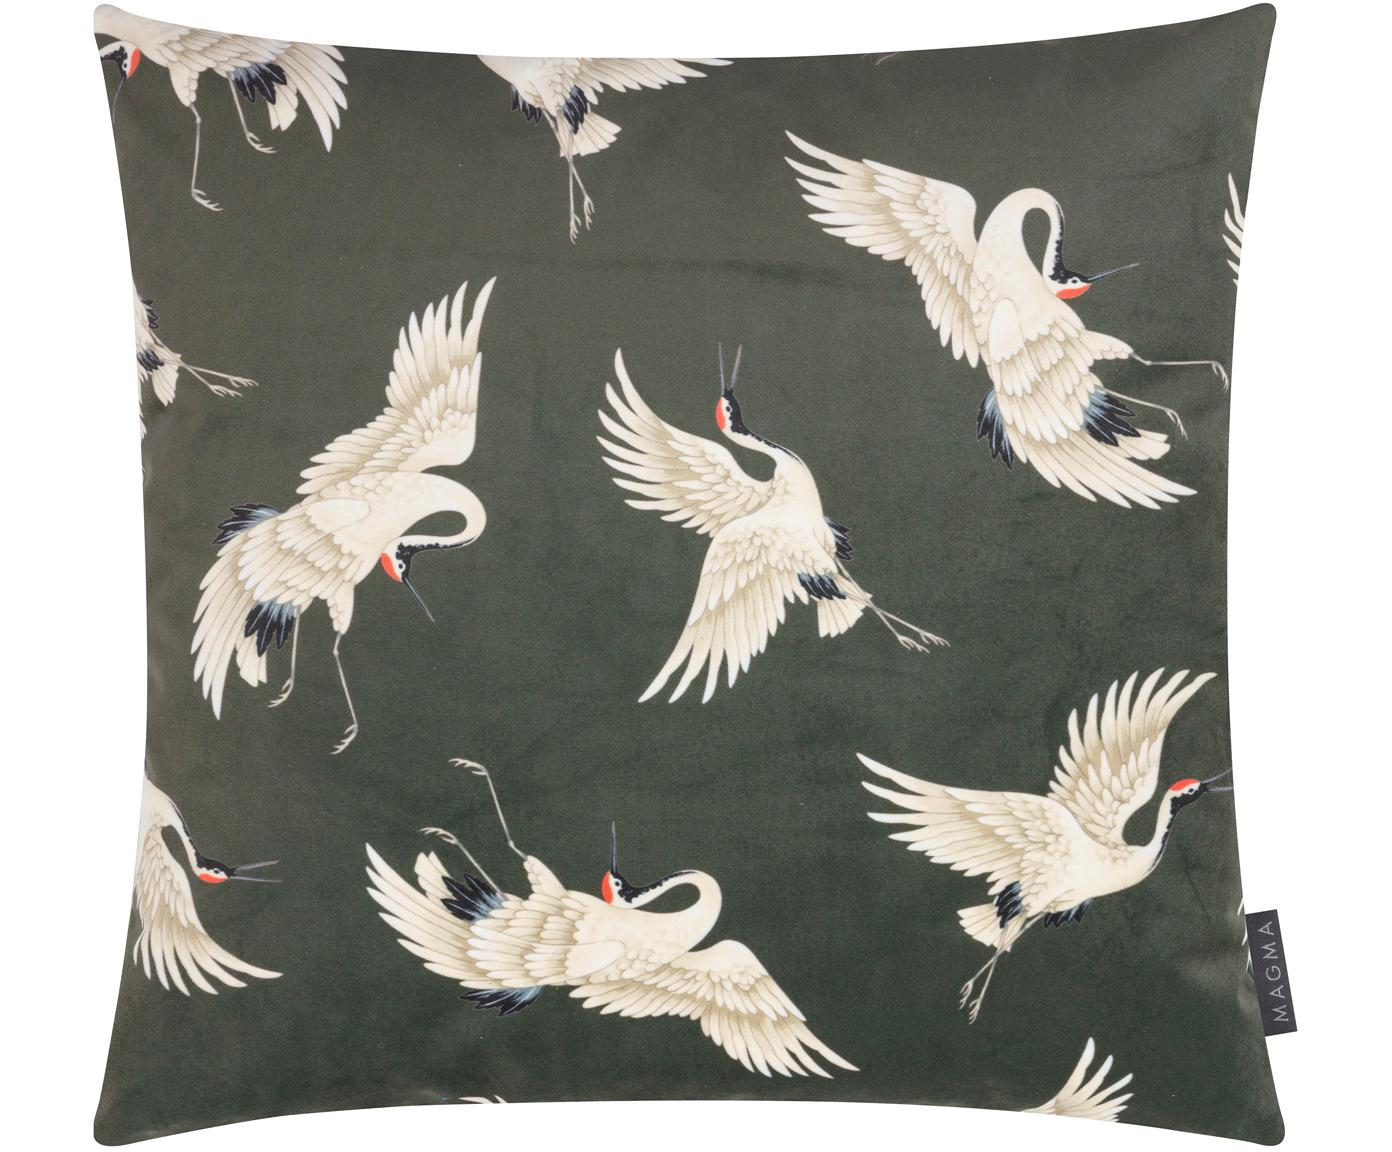 Dubbelzijdige fluwelen kussenhoes Cranes, Bedrukt polyesterfluweel, Groen, beige, zwart, rood, 50 x 50 cm